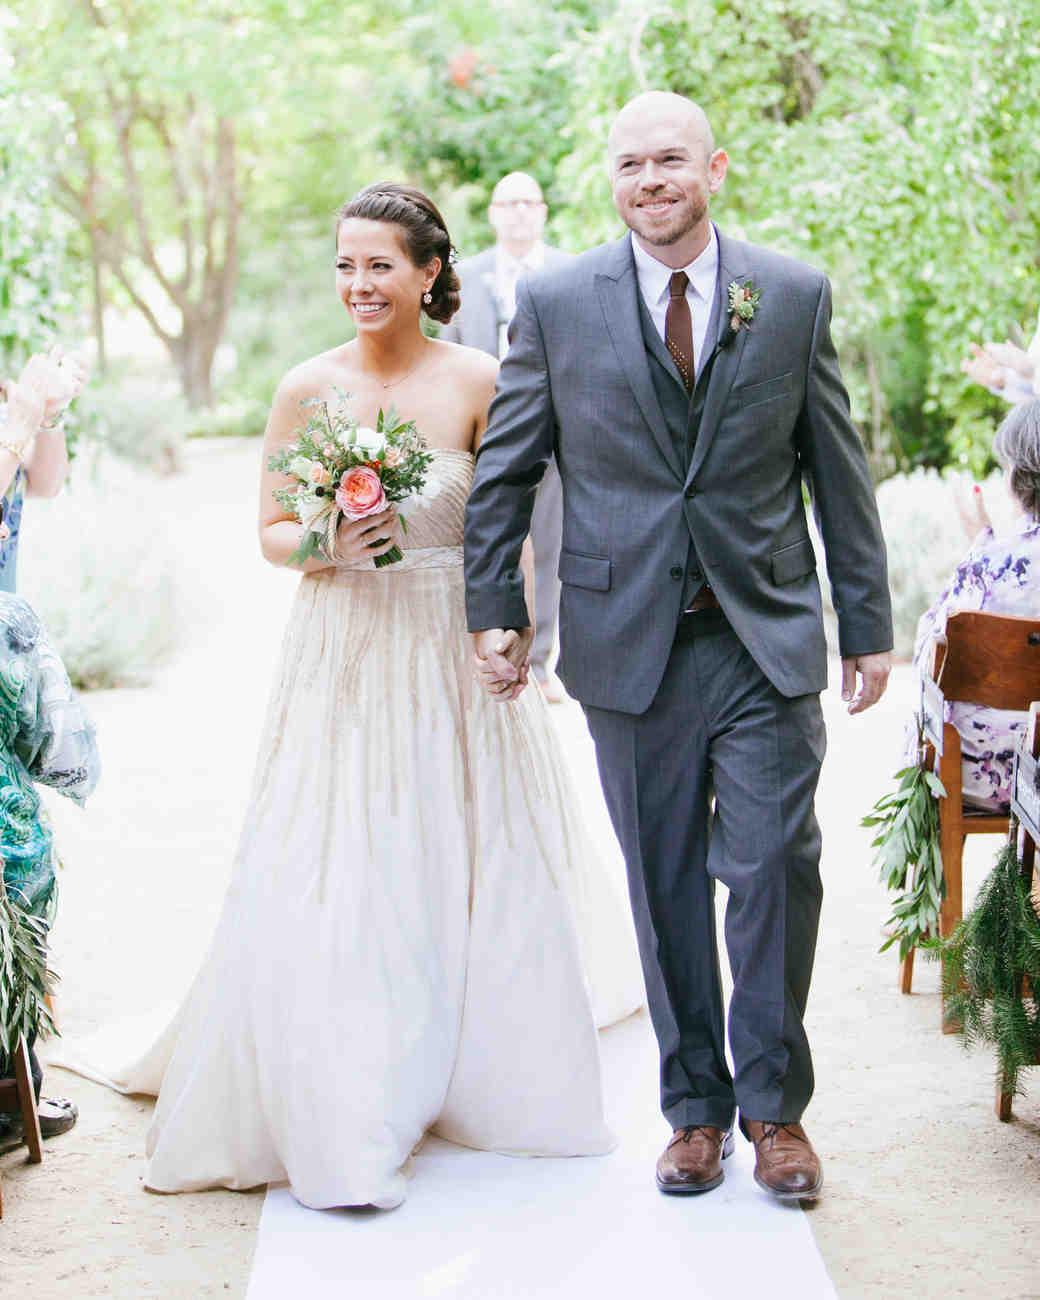 julia-dave-wedding-ceremony2-0414.jpg